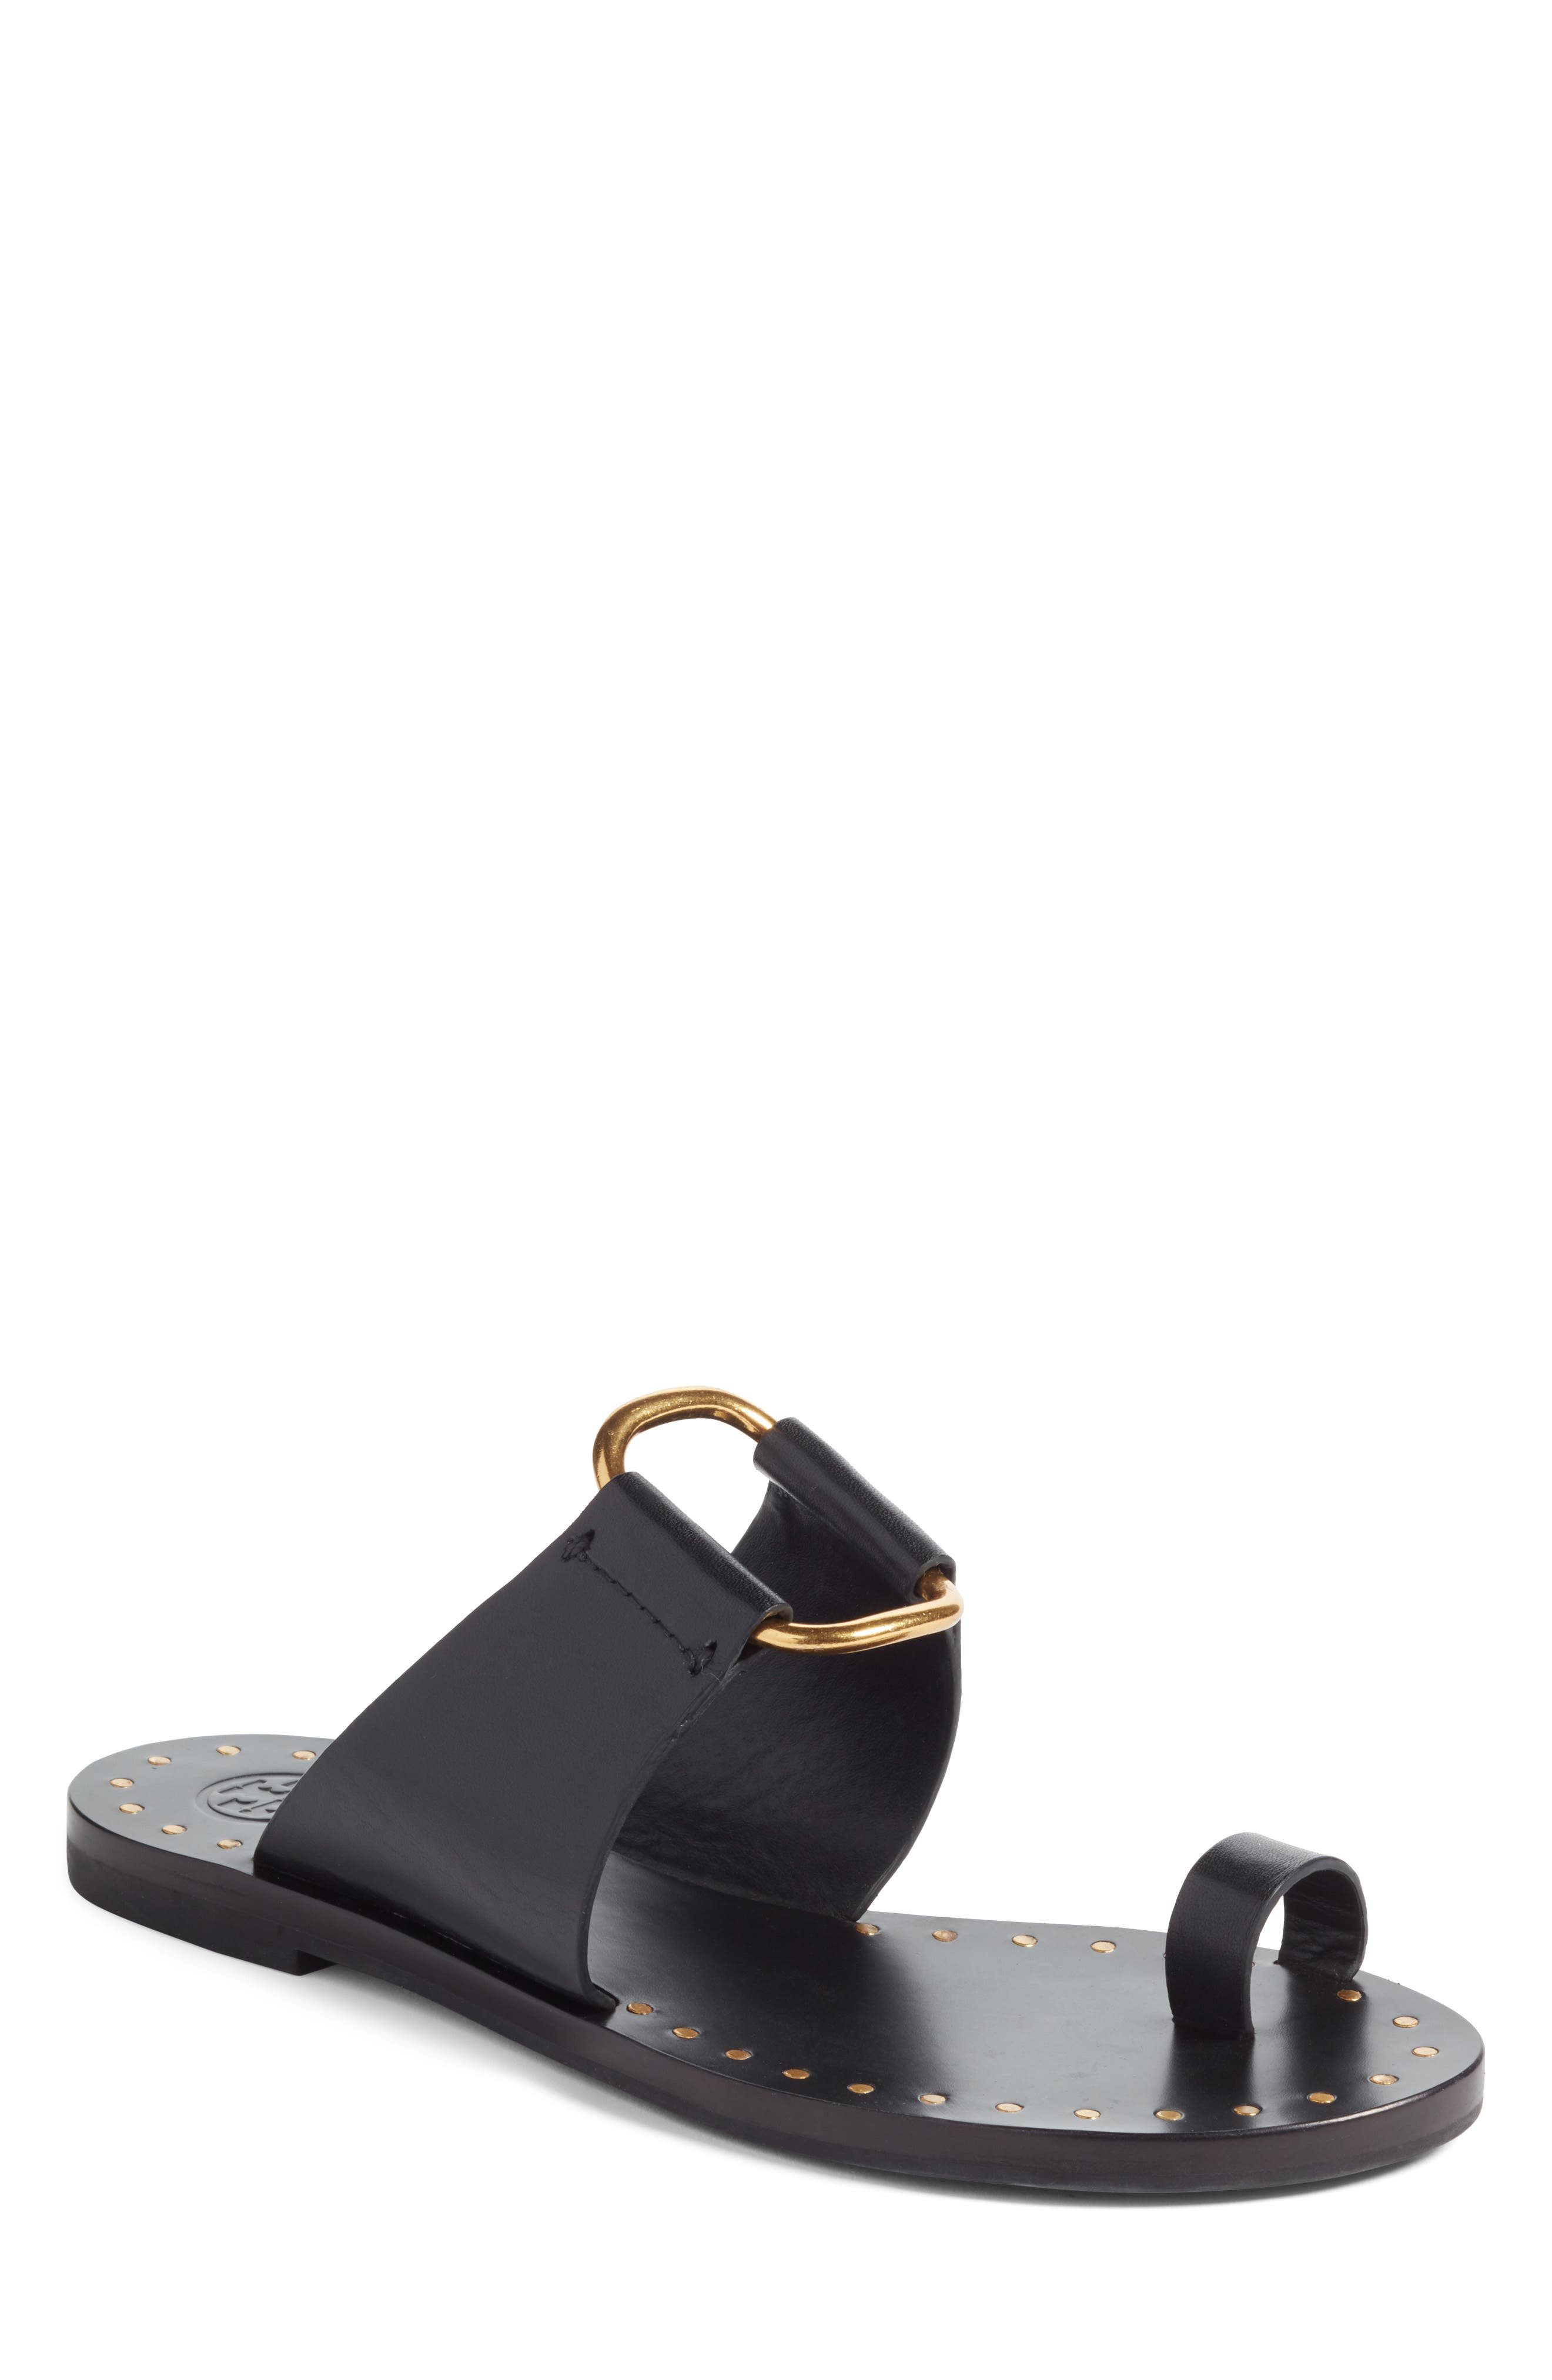 Brannan Studded Sandal,                             Main thumbnail 1, color,                             Perfect Black